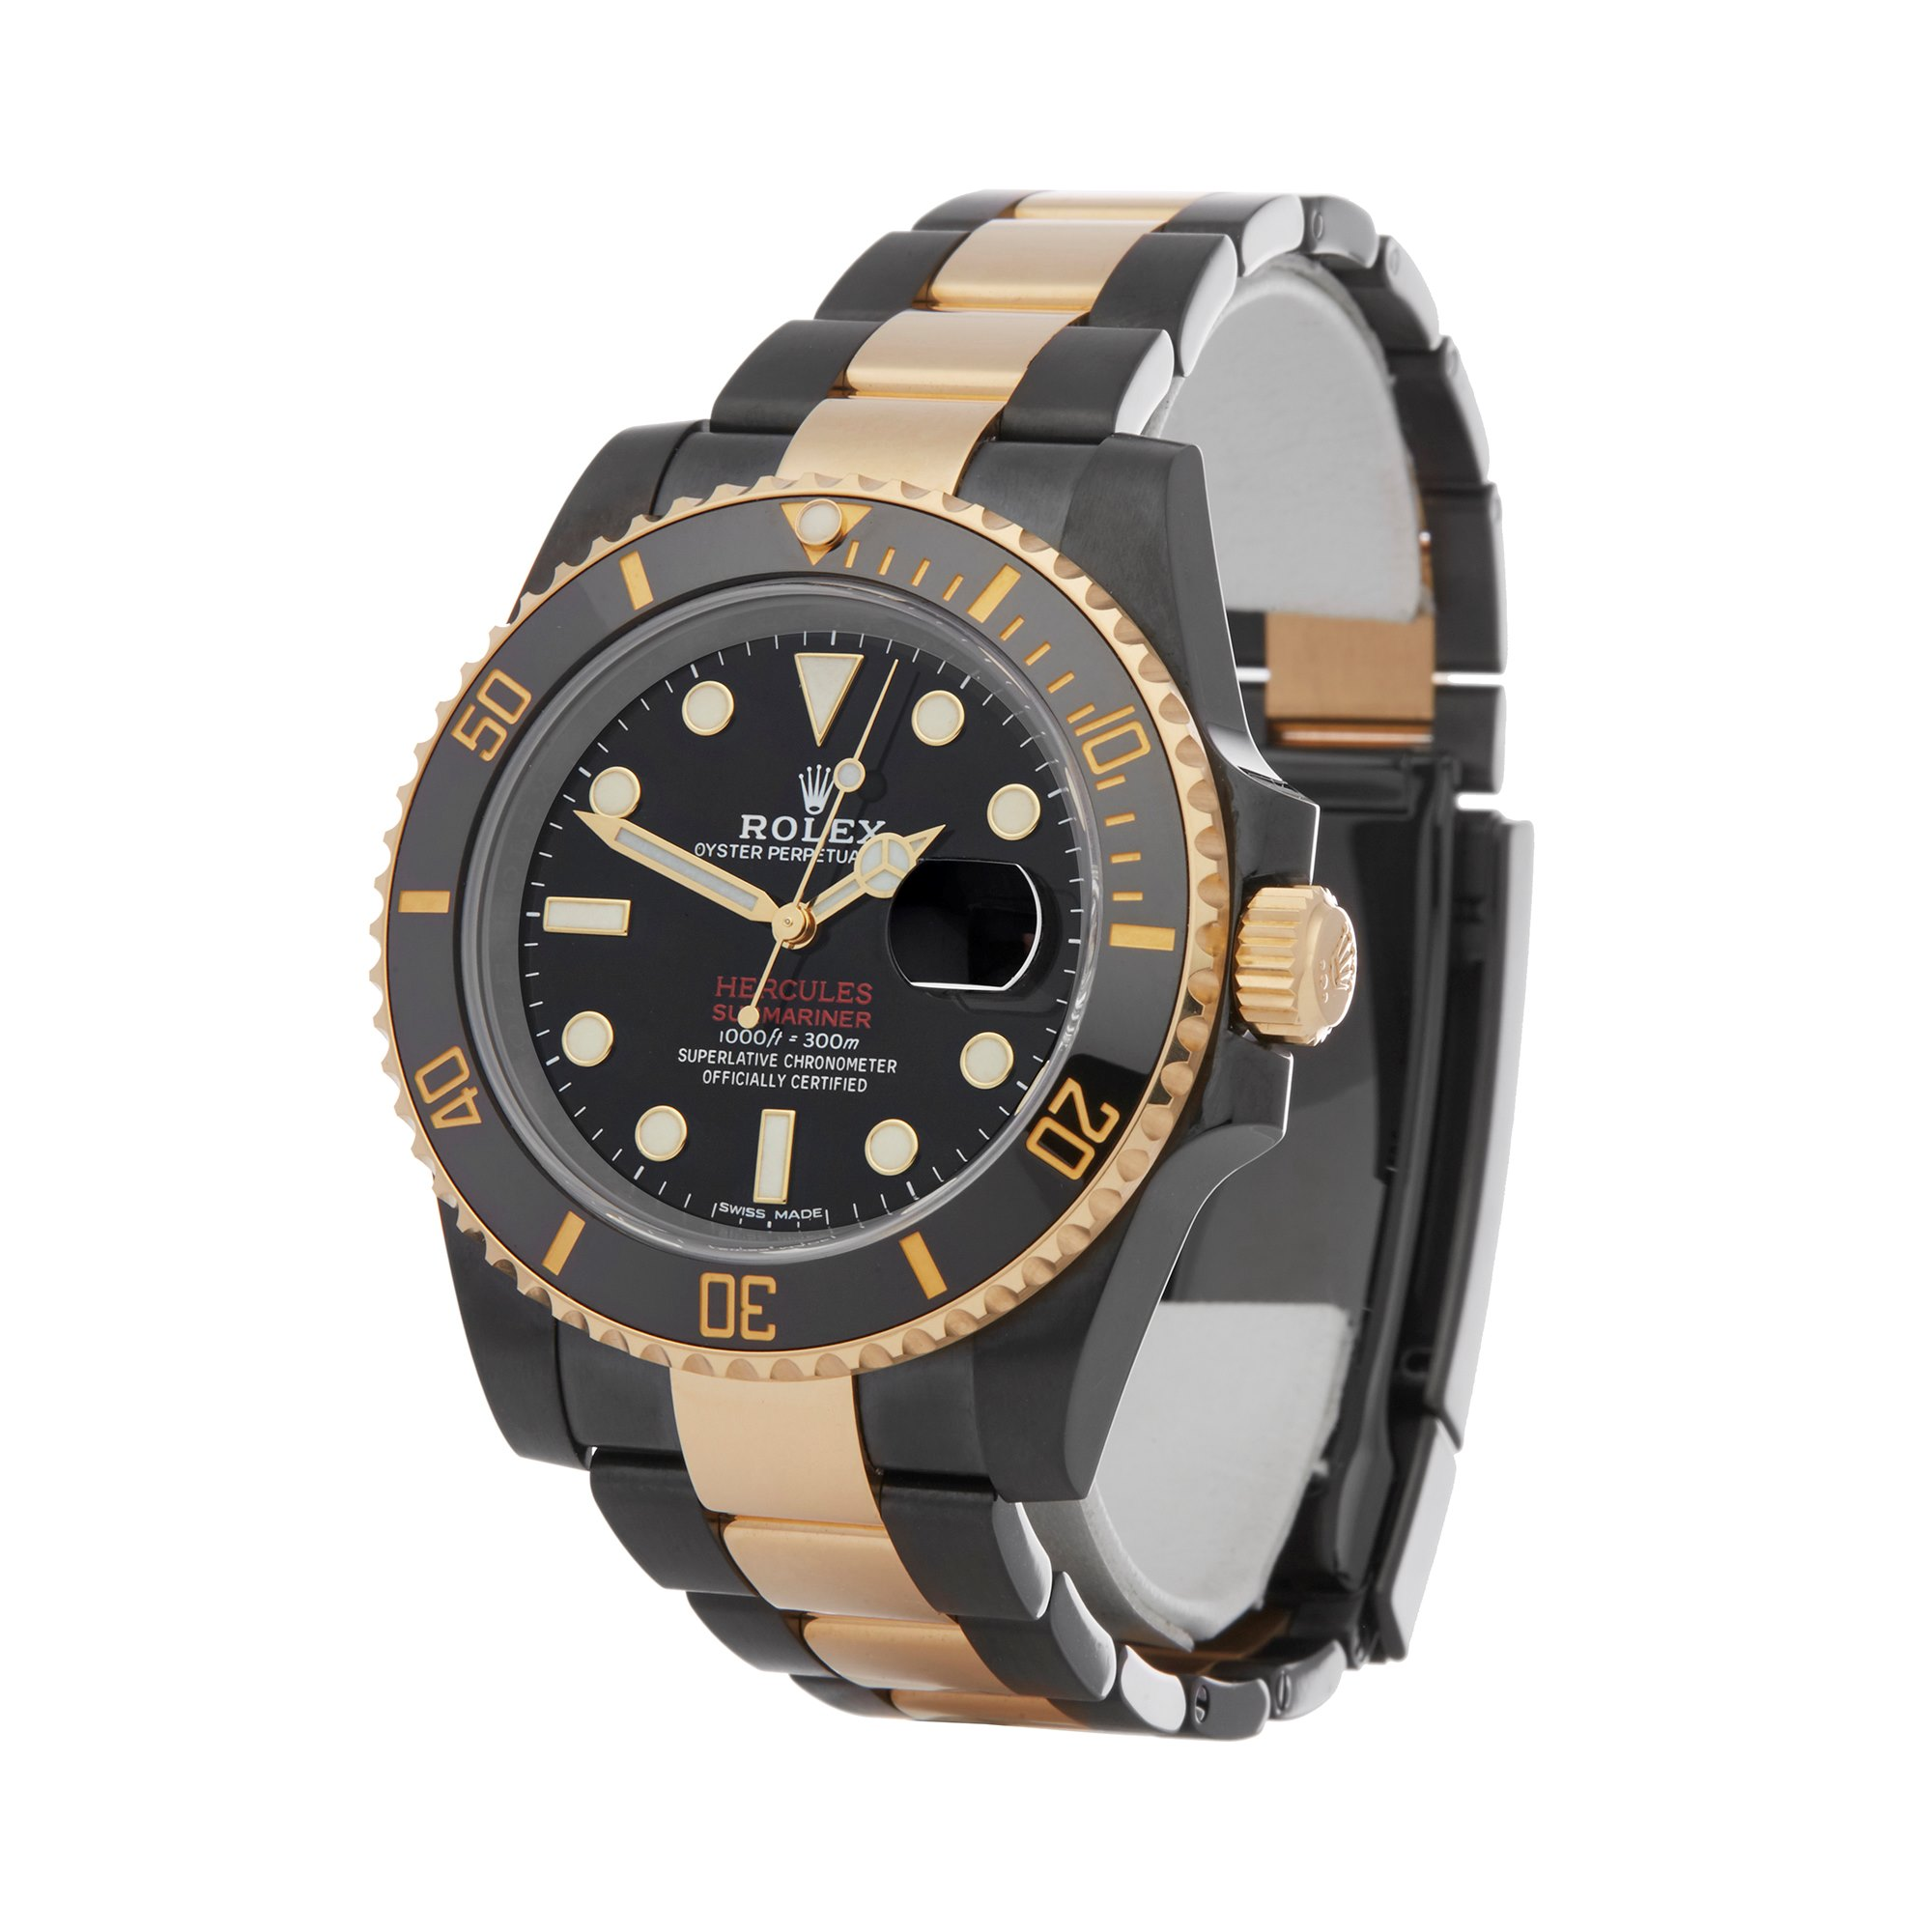 Rolex Submariner Date Hercules Dlc Stainless Steel & Yellow Gold 116613LN